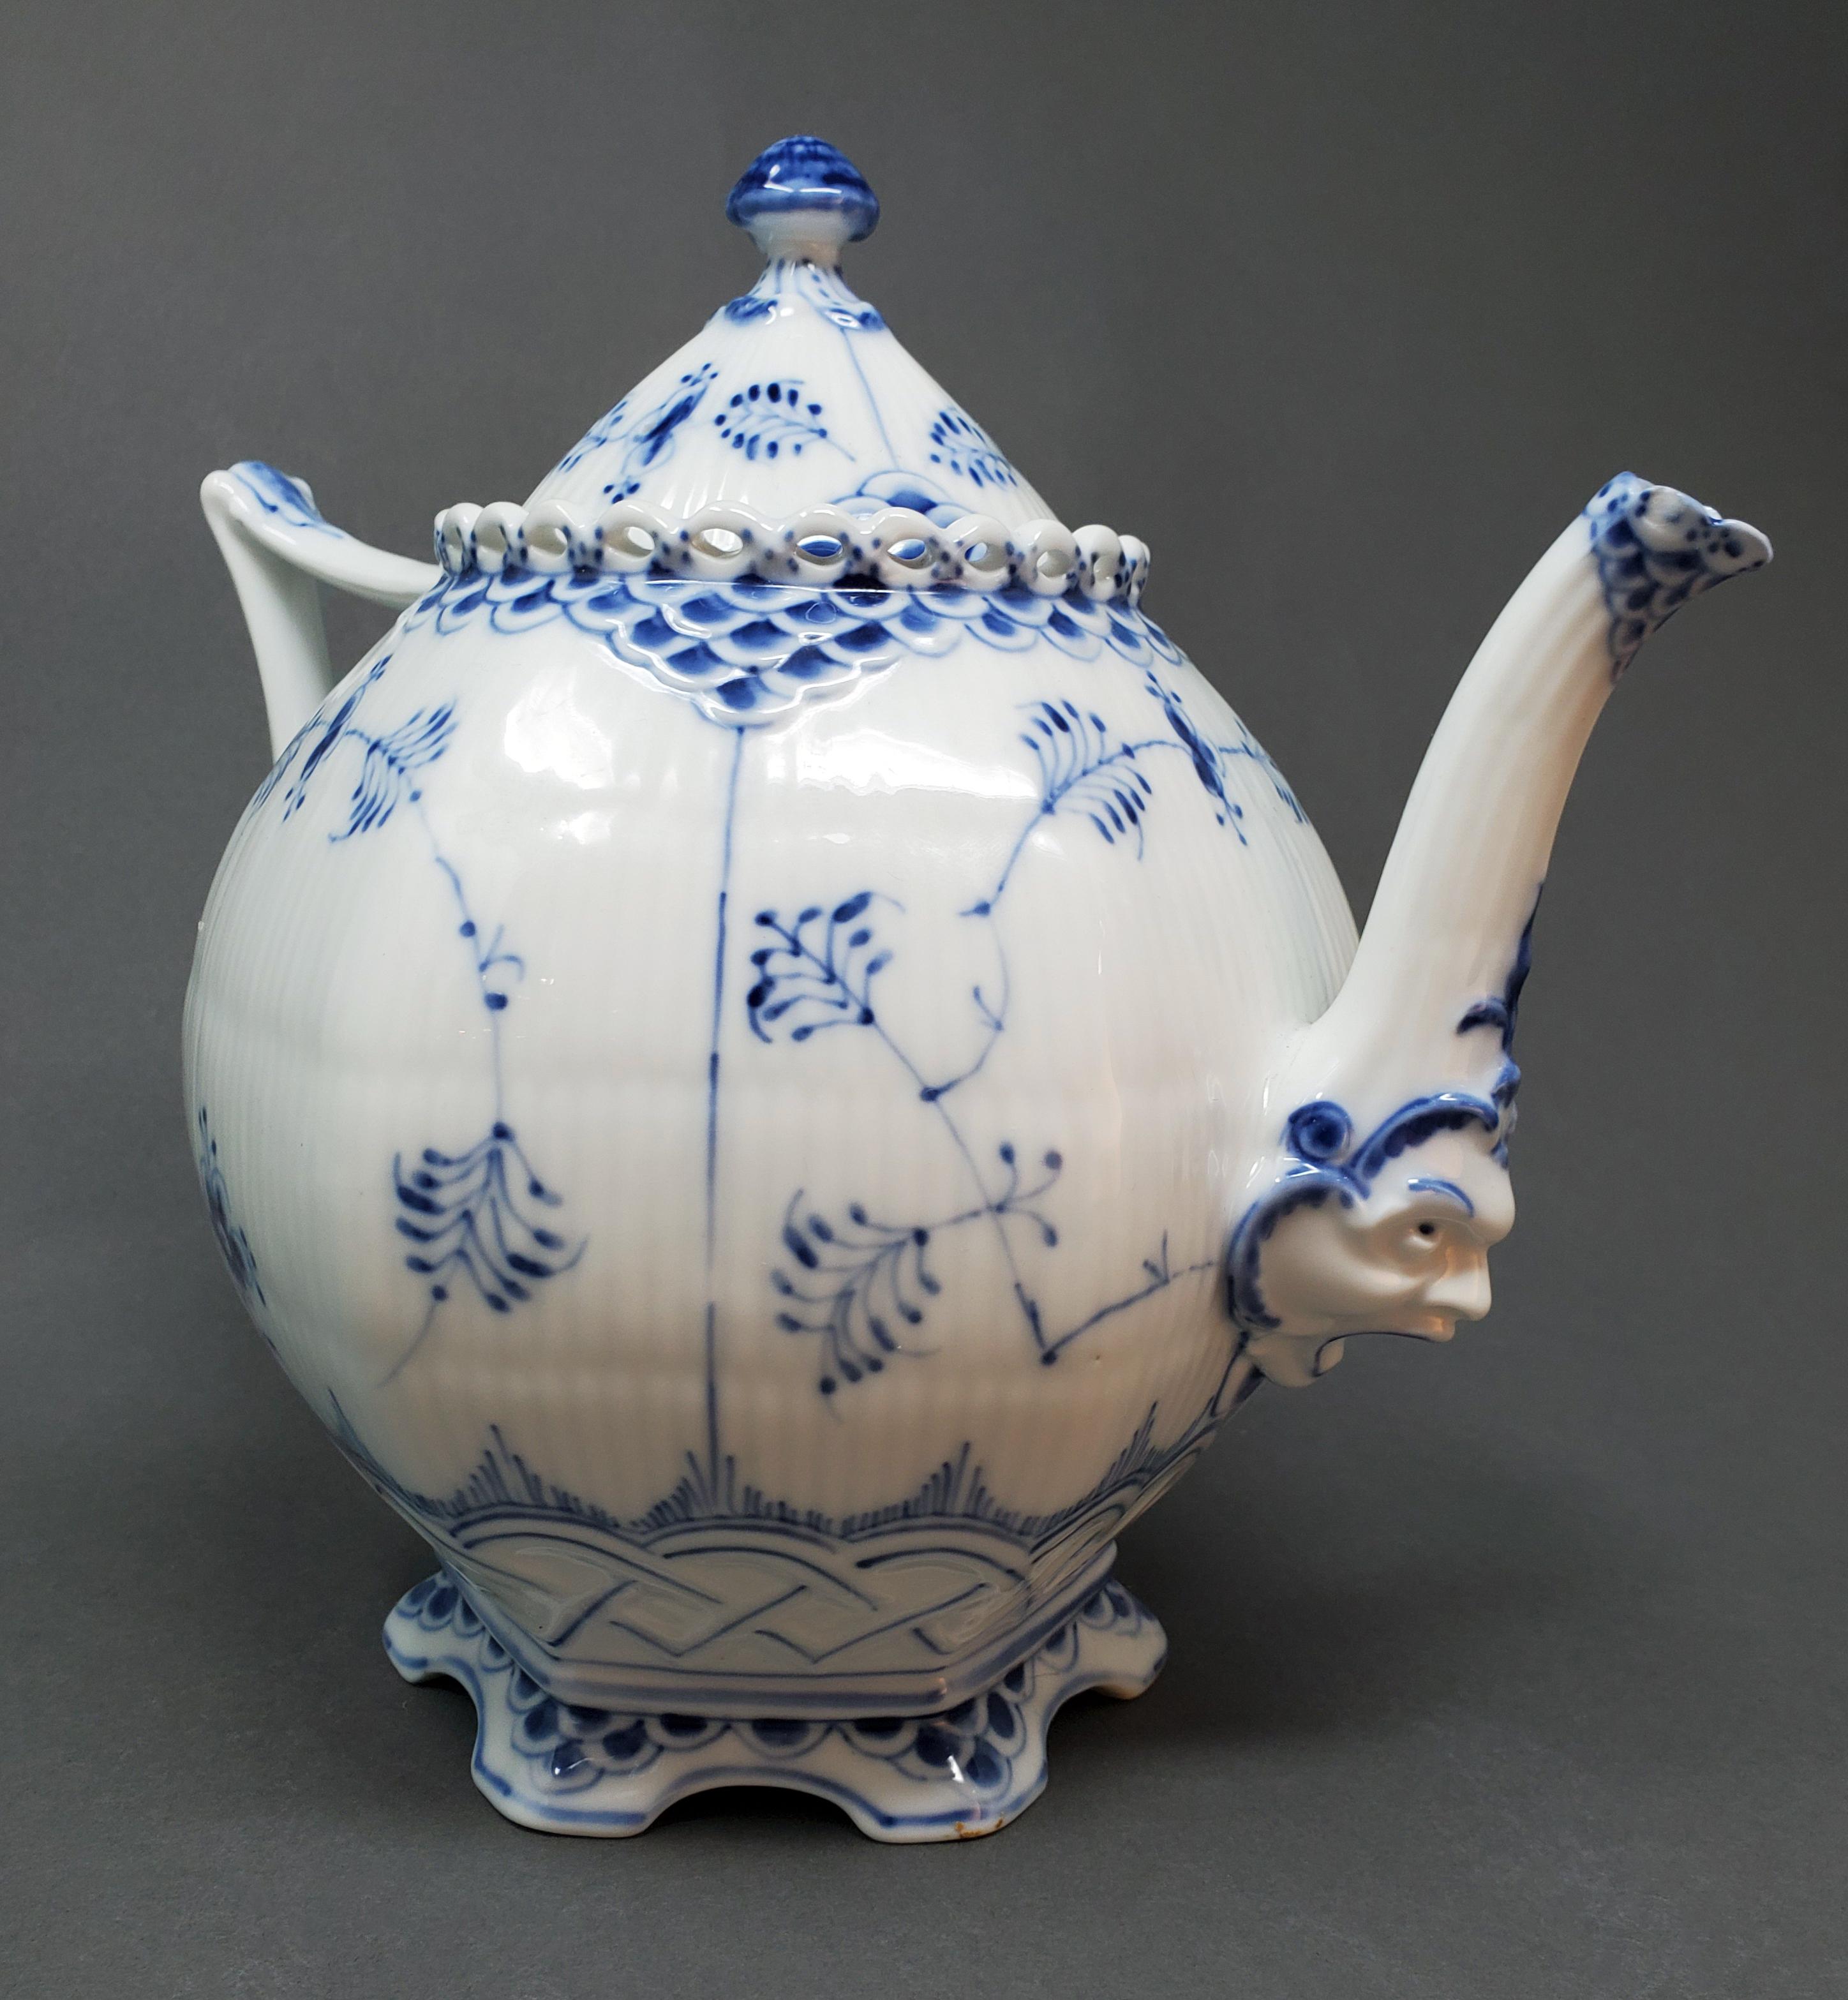 copenhagen-face-teapot-large.jpg